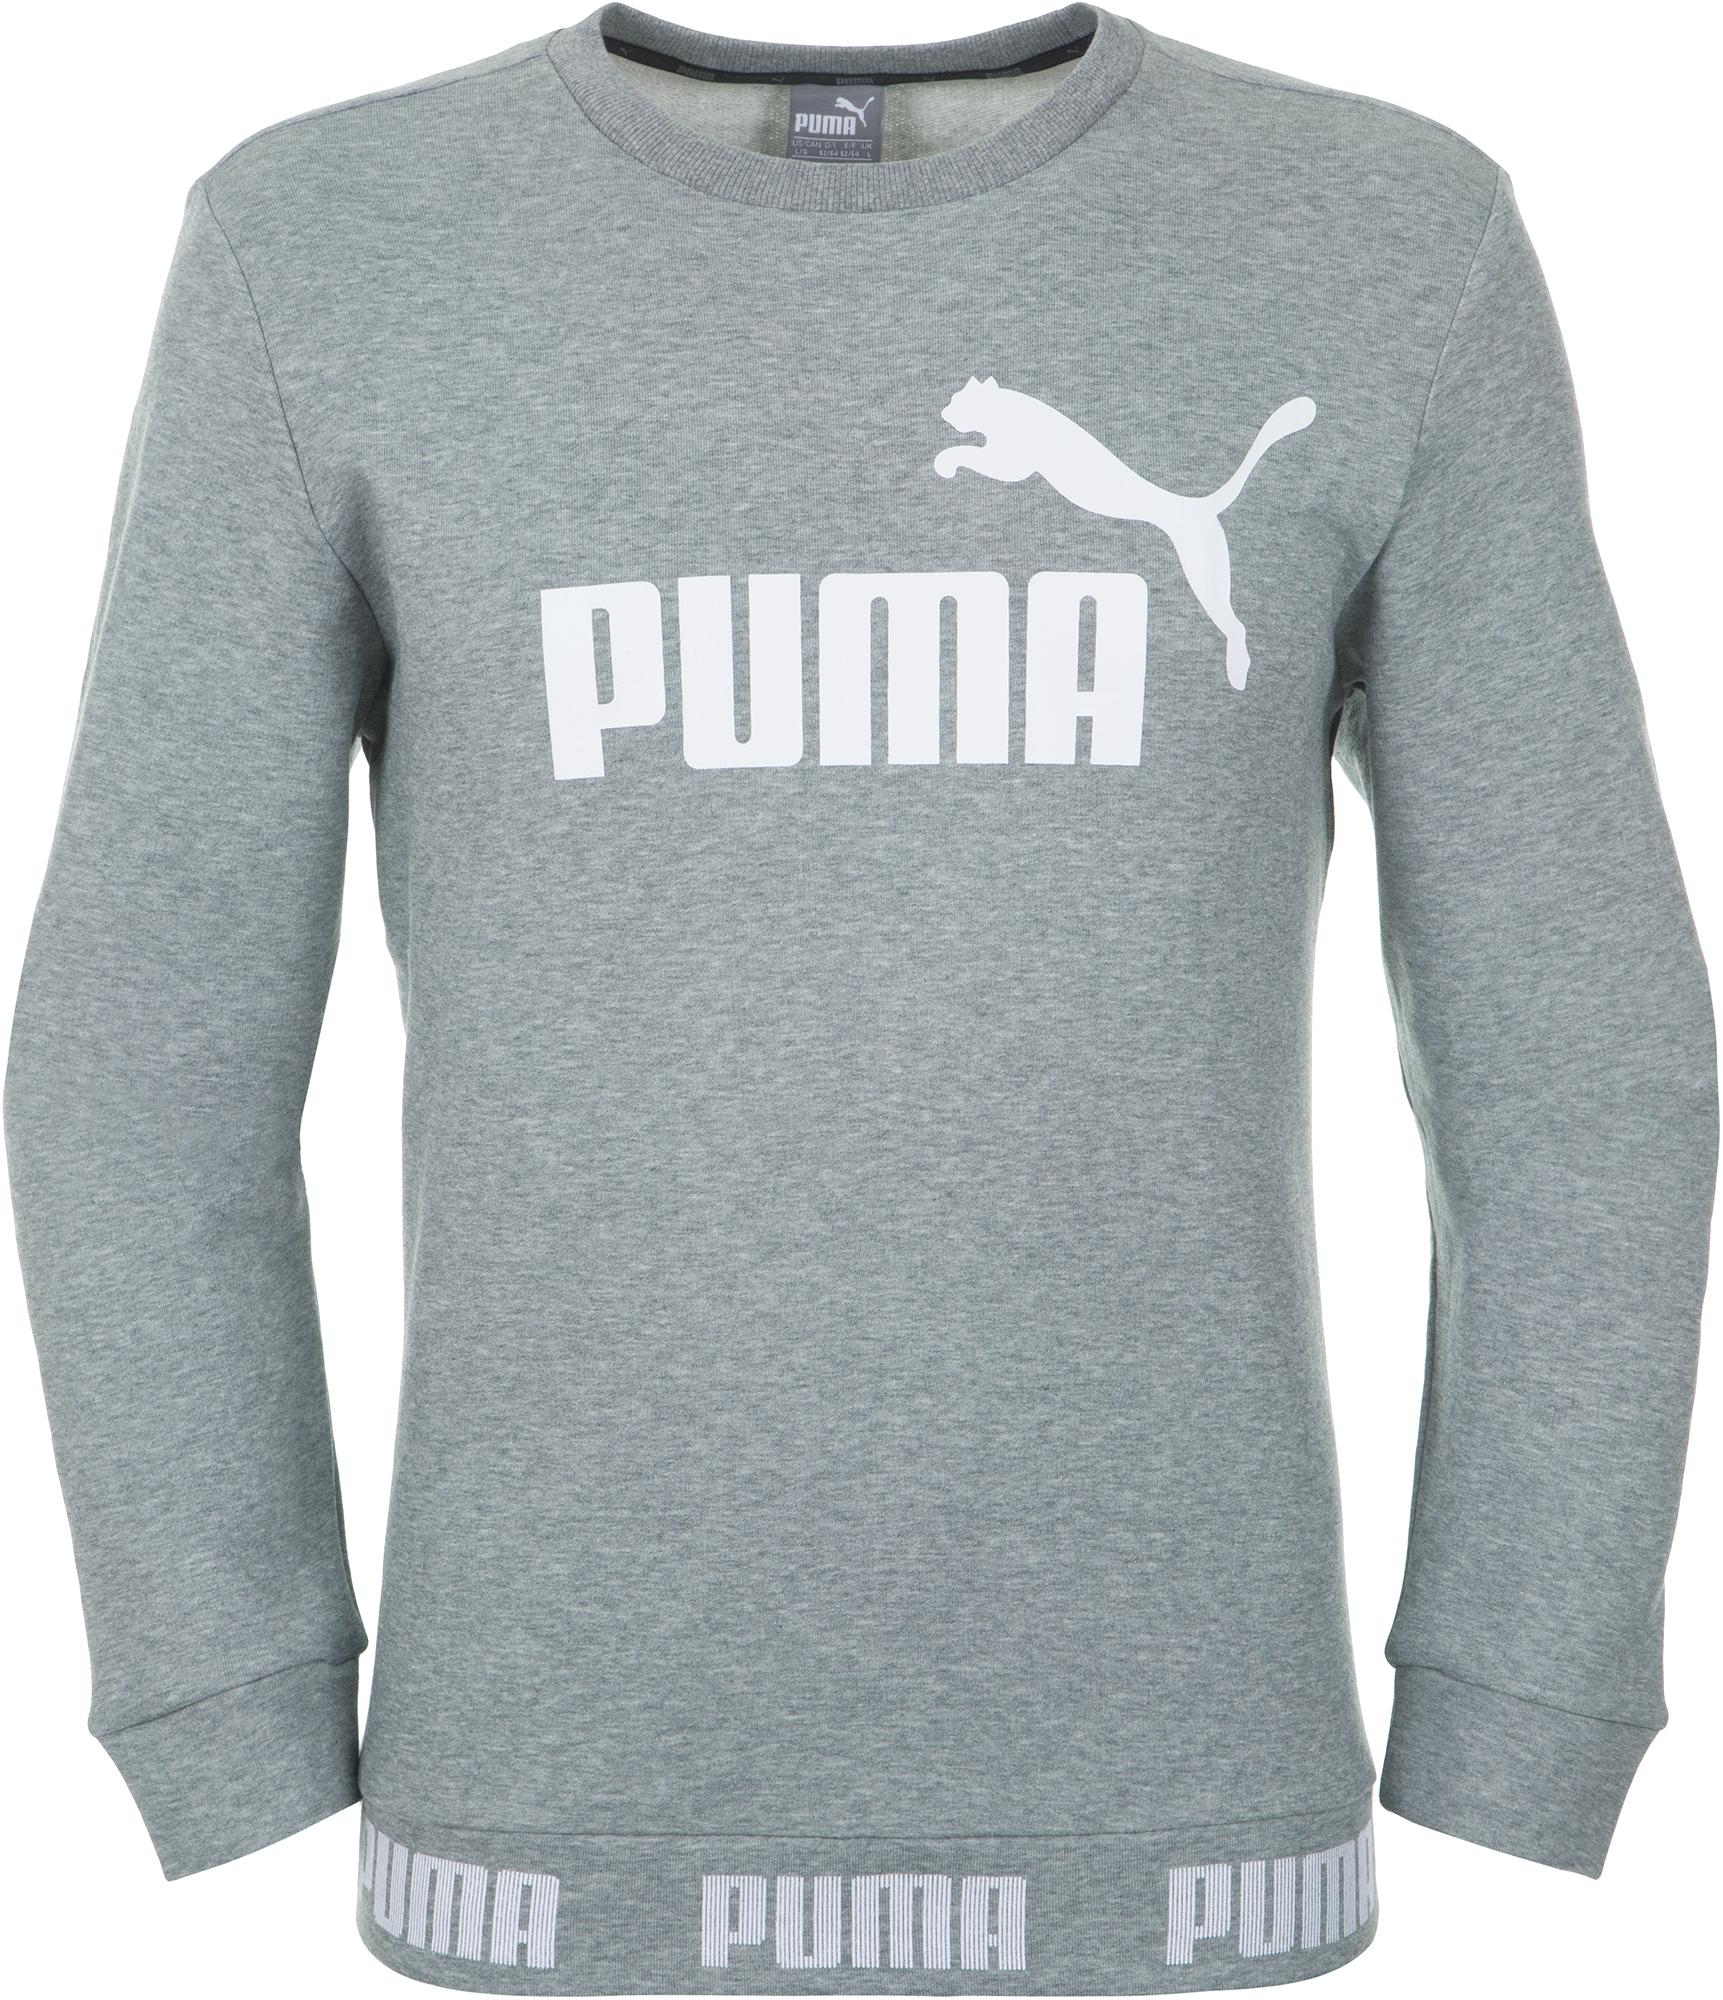 Puma Джемпер мужской Puma Amplified Crew, размер 52-54